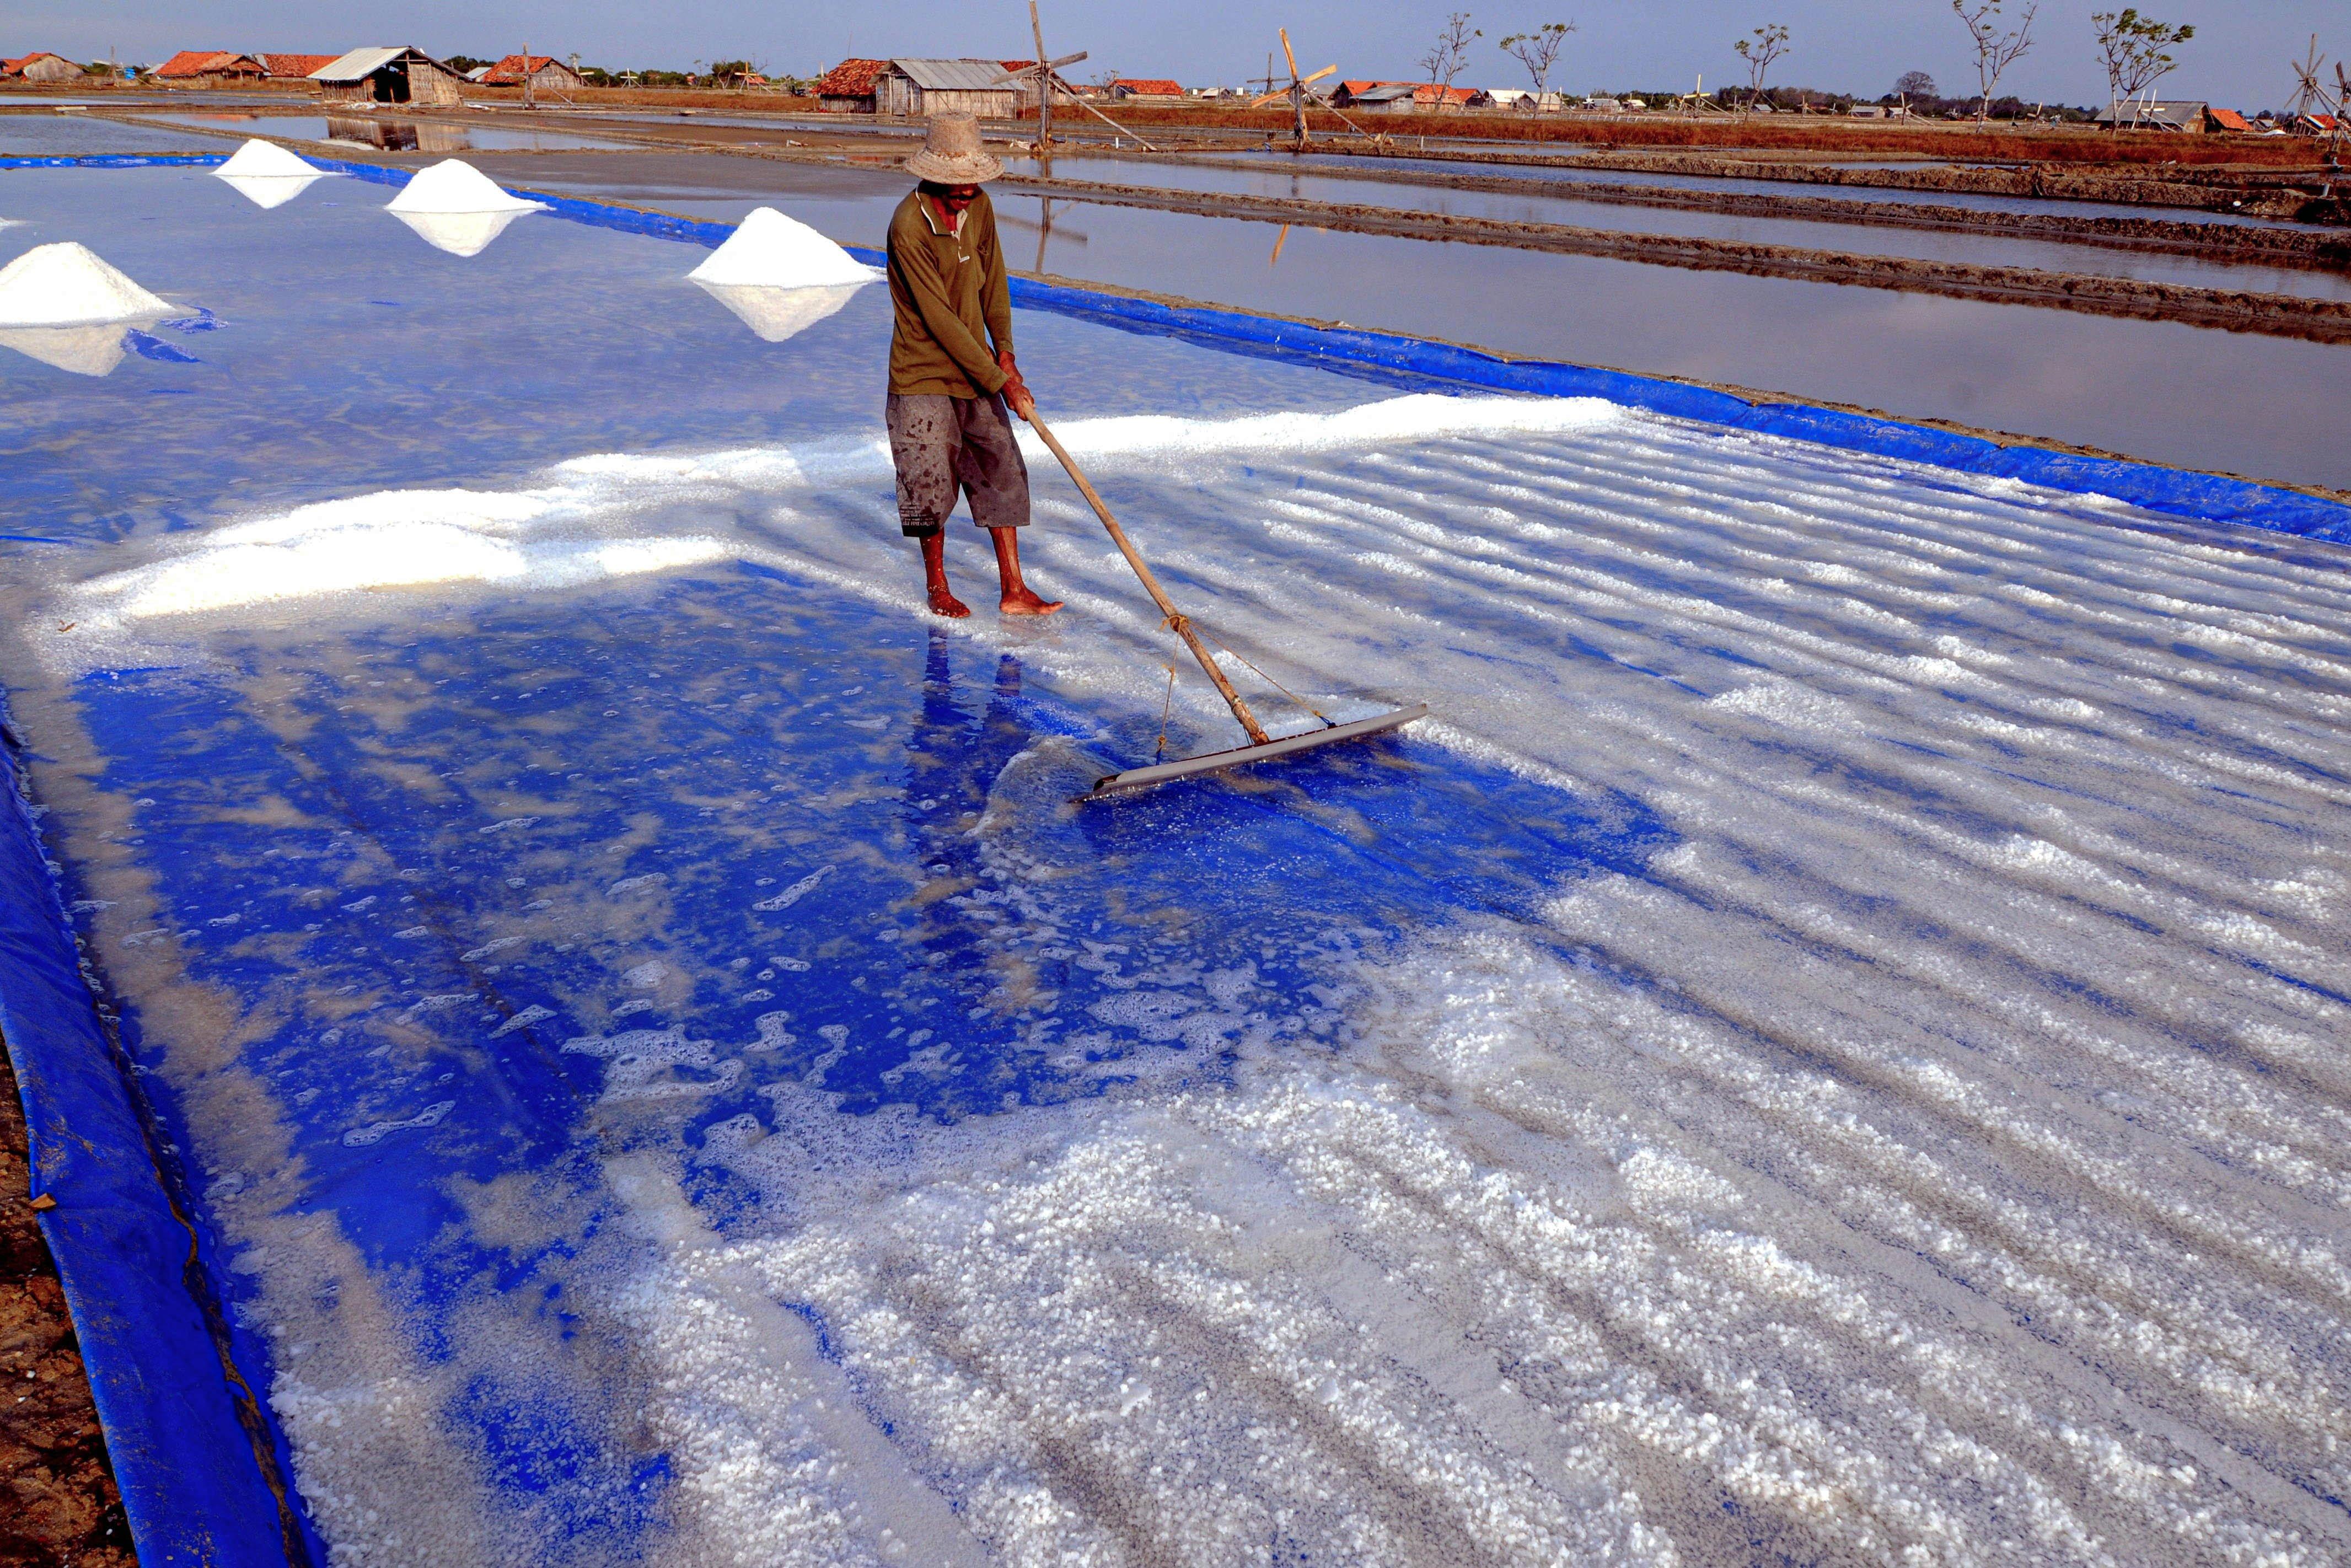 Petani memanen garam di lahan yang menggunakan teknik geomembran di Desa Bunder, Pademawu, Pamekasan, Jawa Timur.